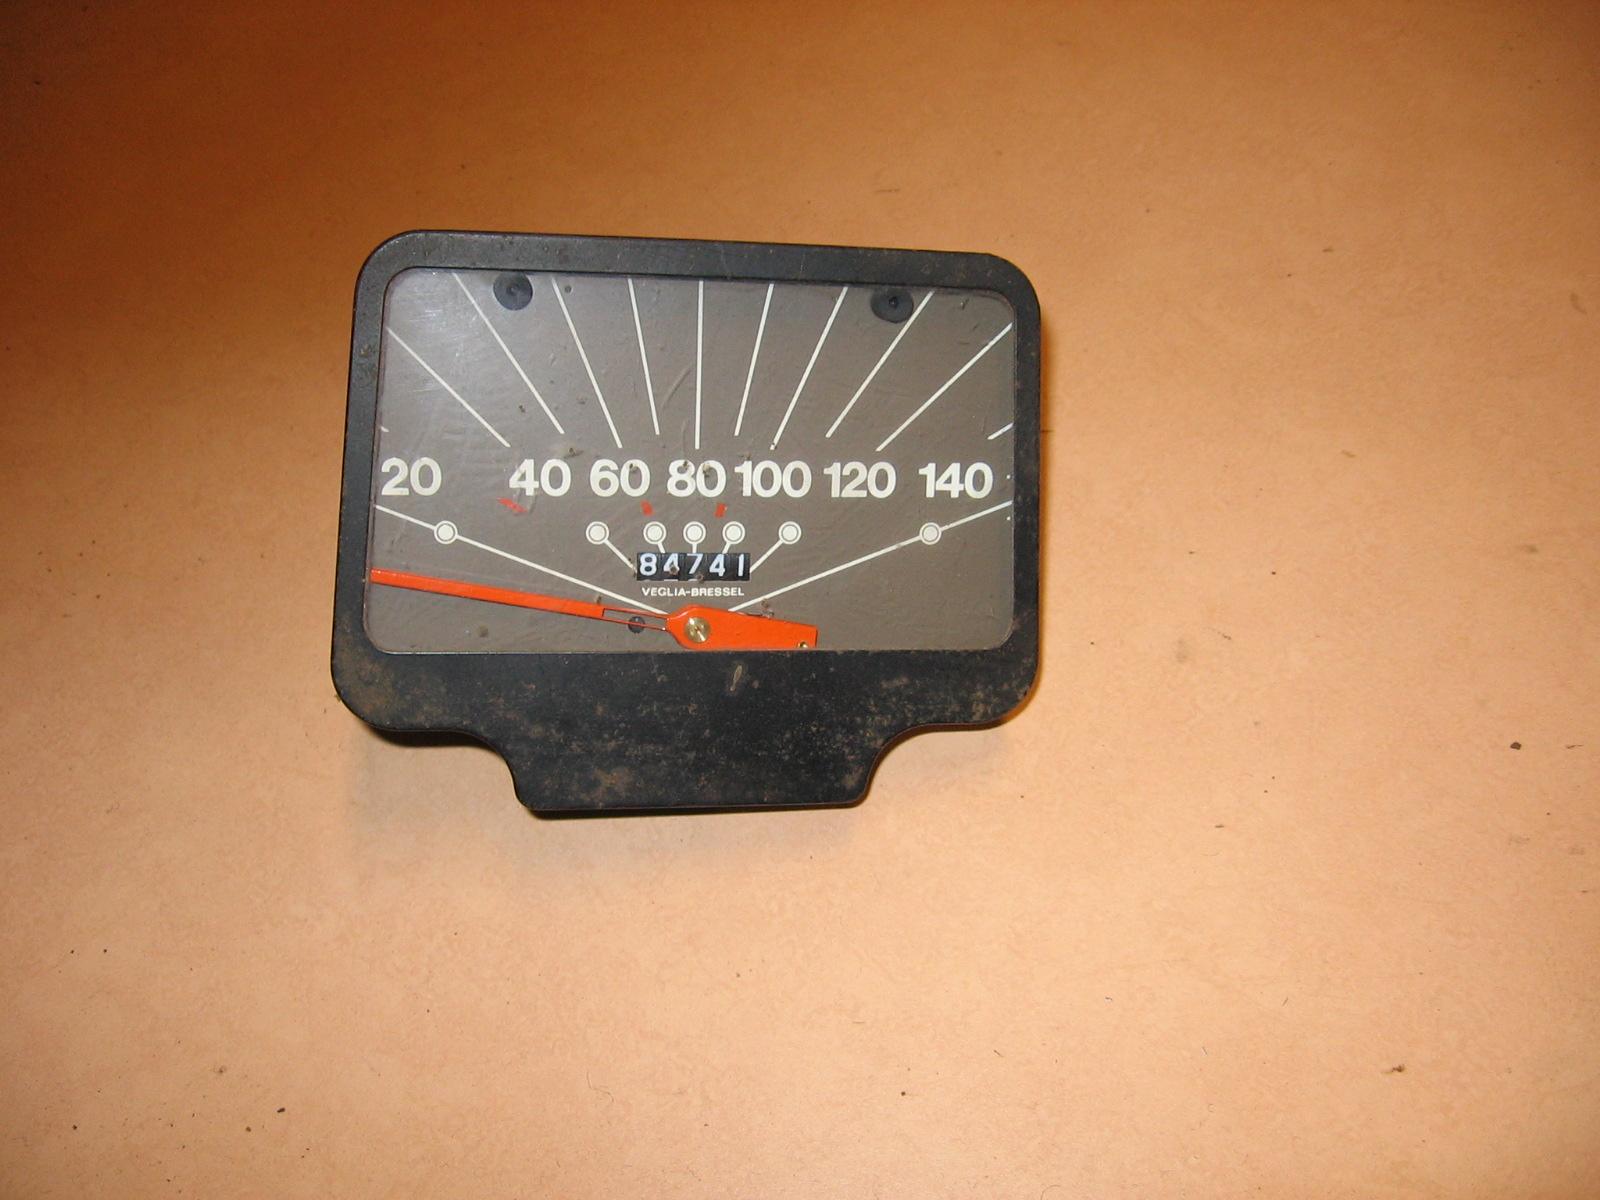 OD0443 dashboardklok + kilometerteller voor Dyane